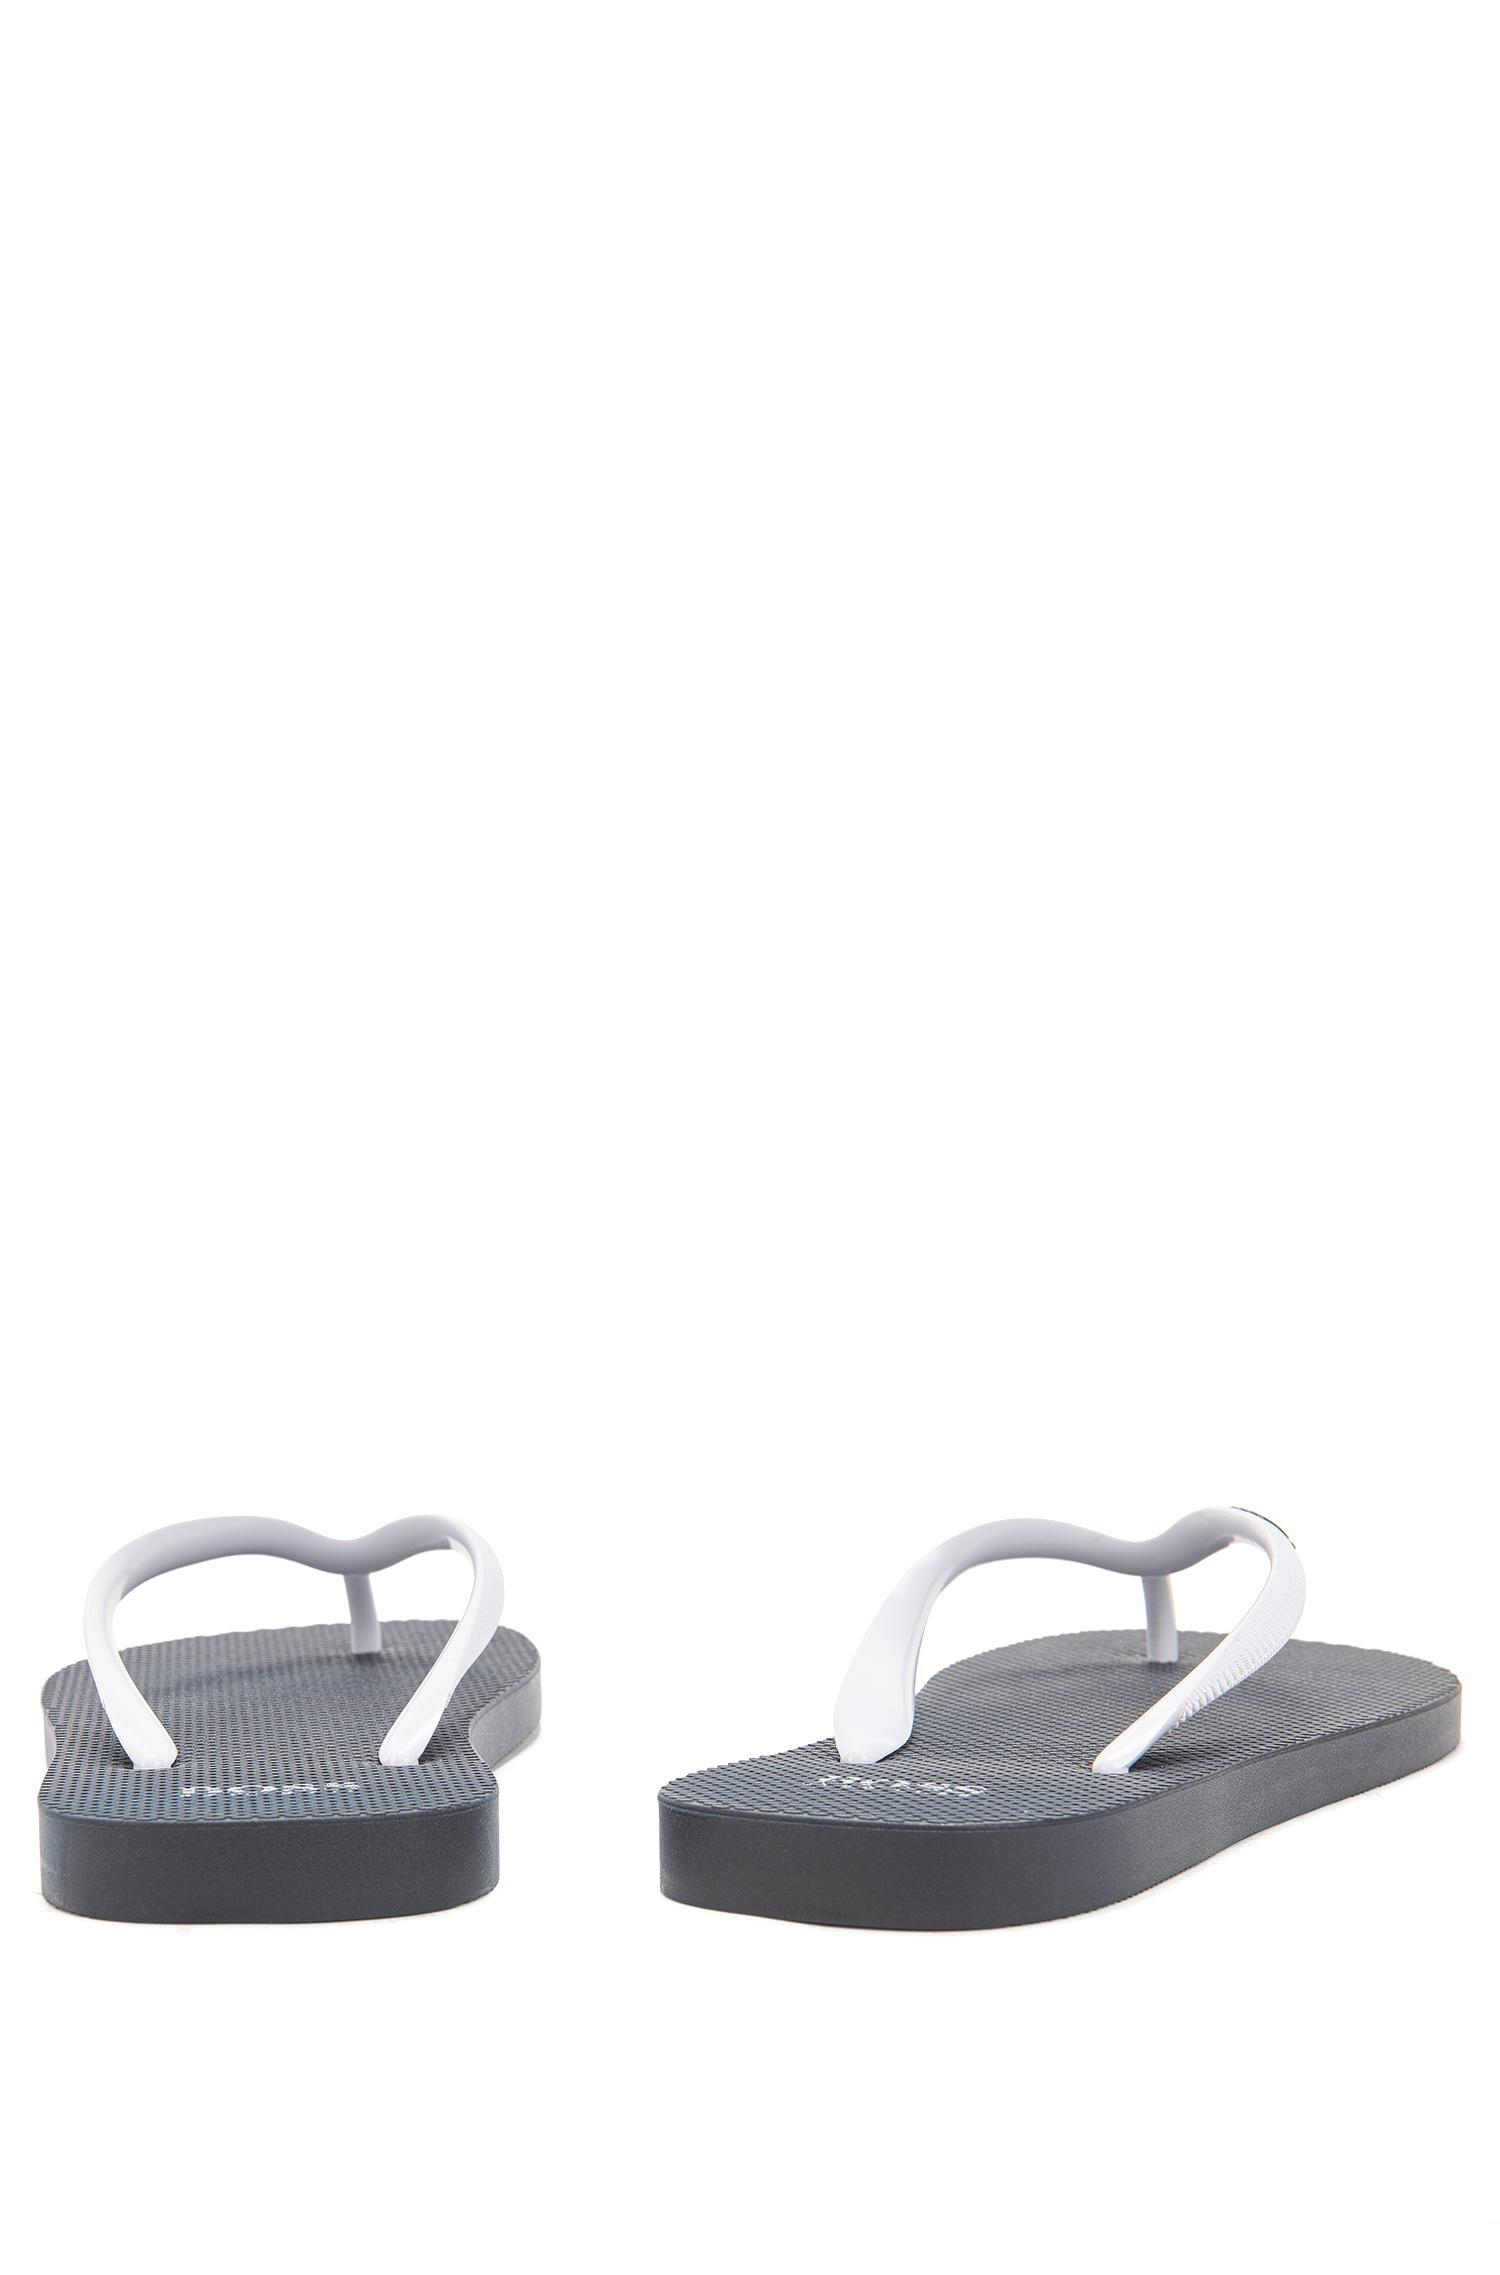 Toe-post flip-flops in textured rubber BOSS 2Xx0j